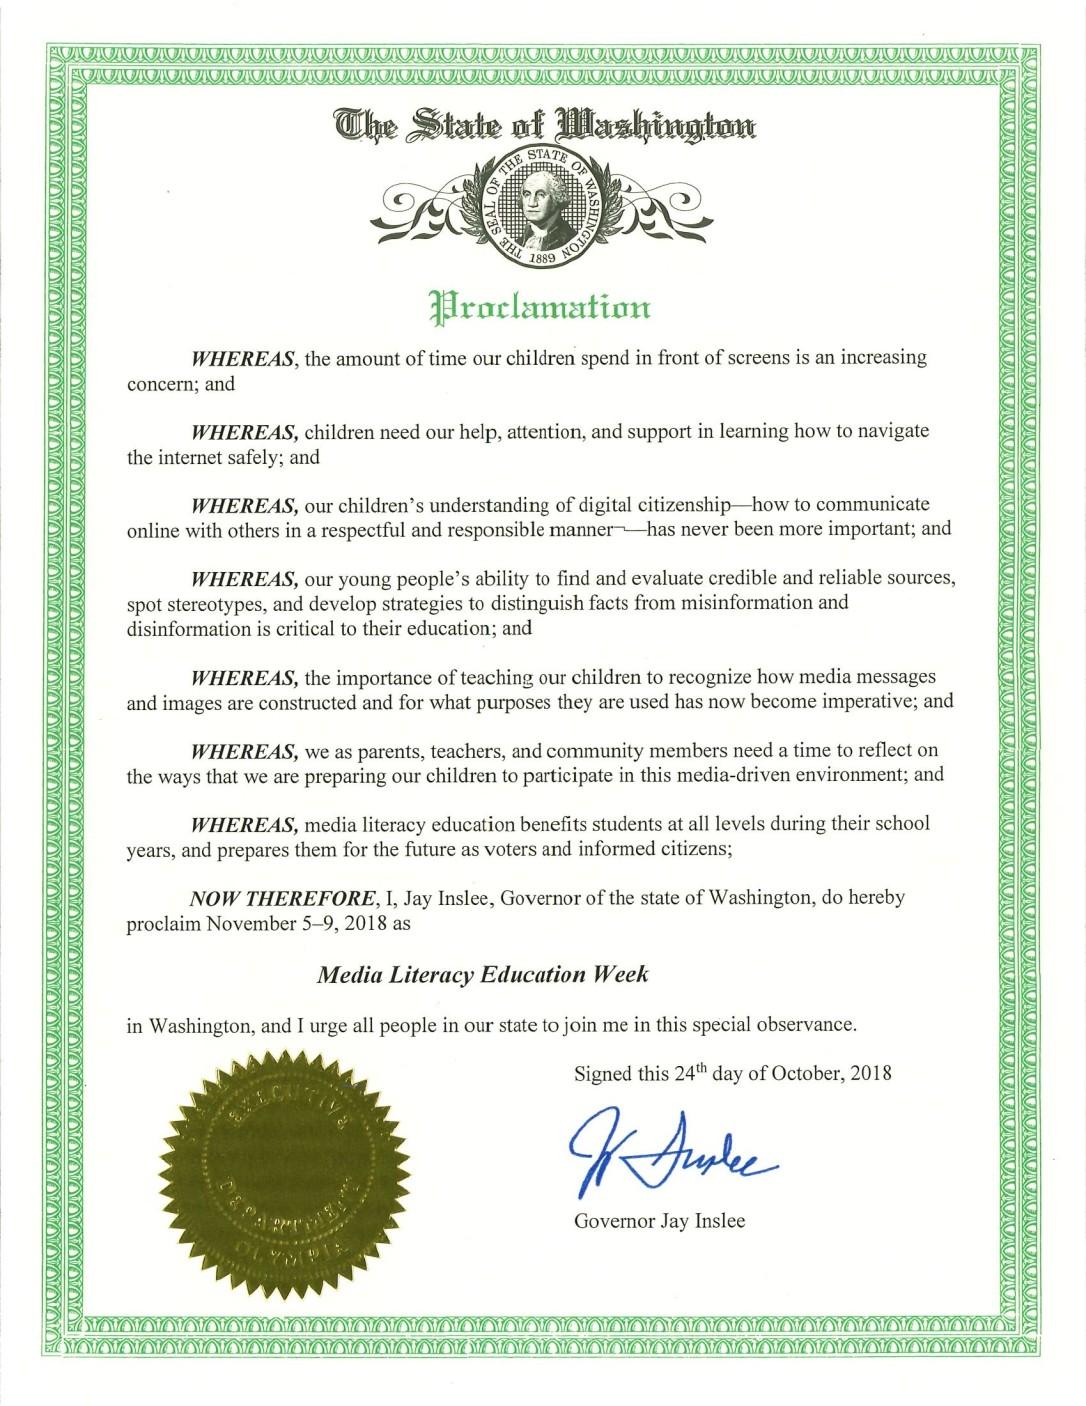 Governor's Proclamation ML Week 2018.jpg